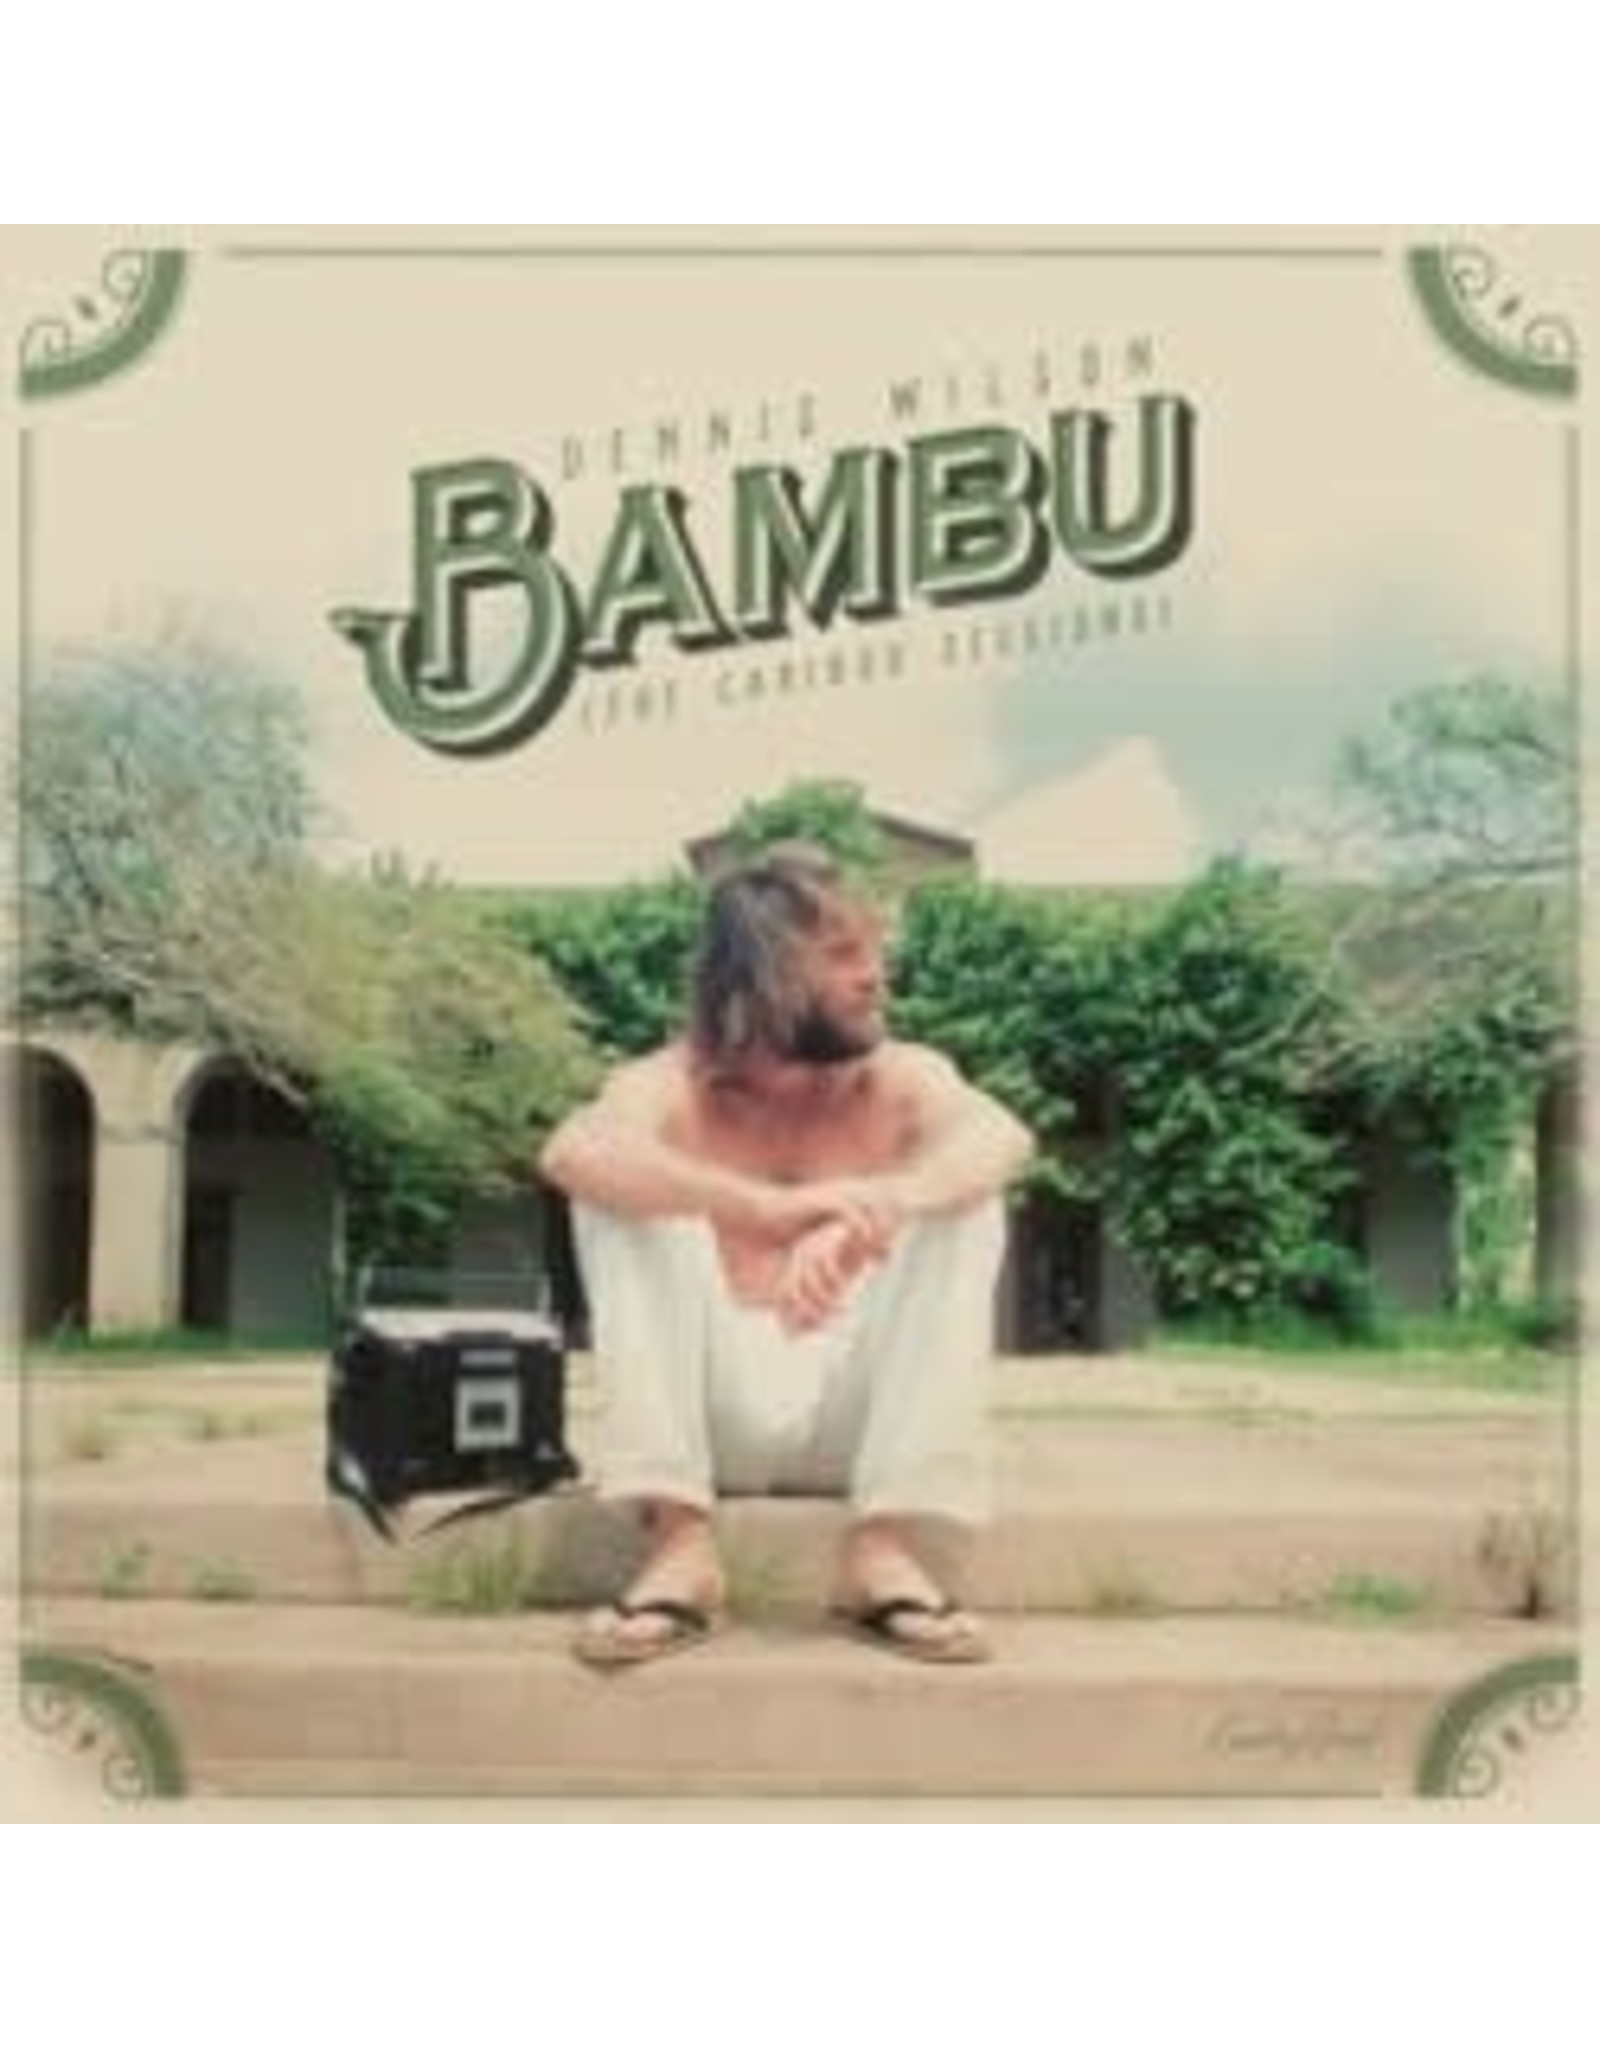 Wilson, Dennis (Beach Boys) - Bambu Caribou Sessions) LP